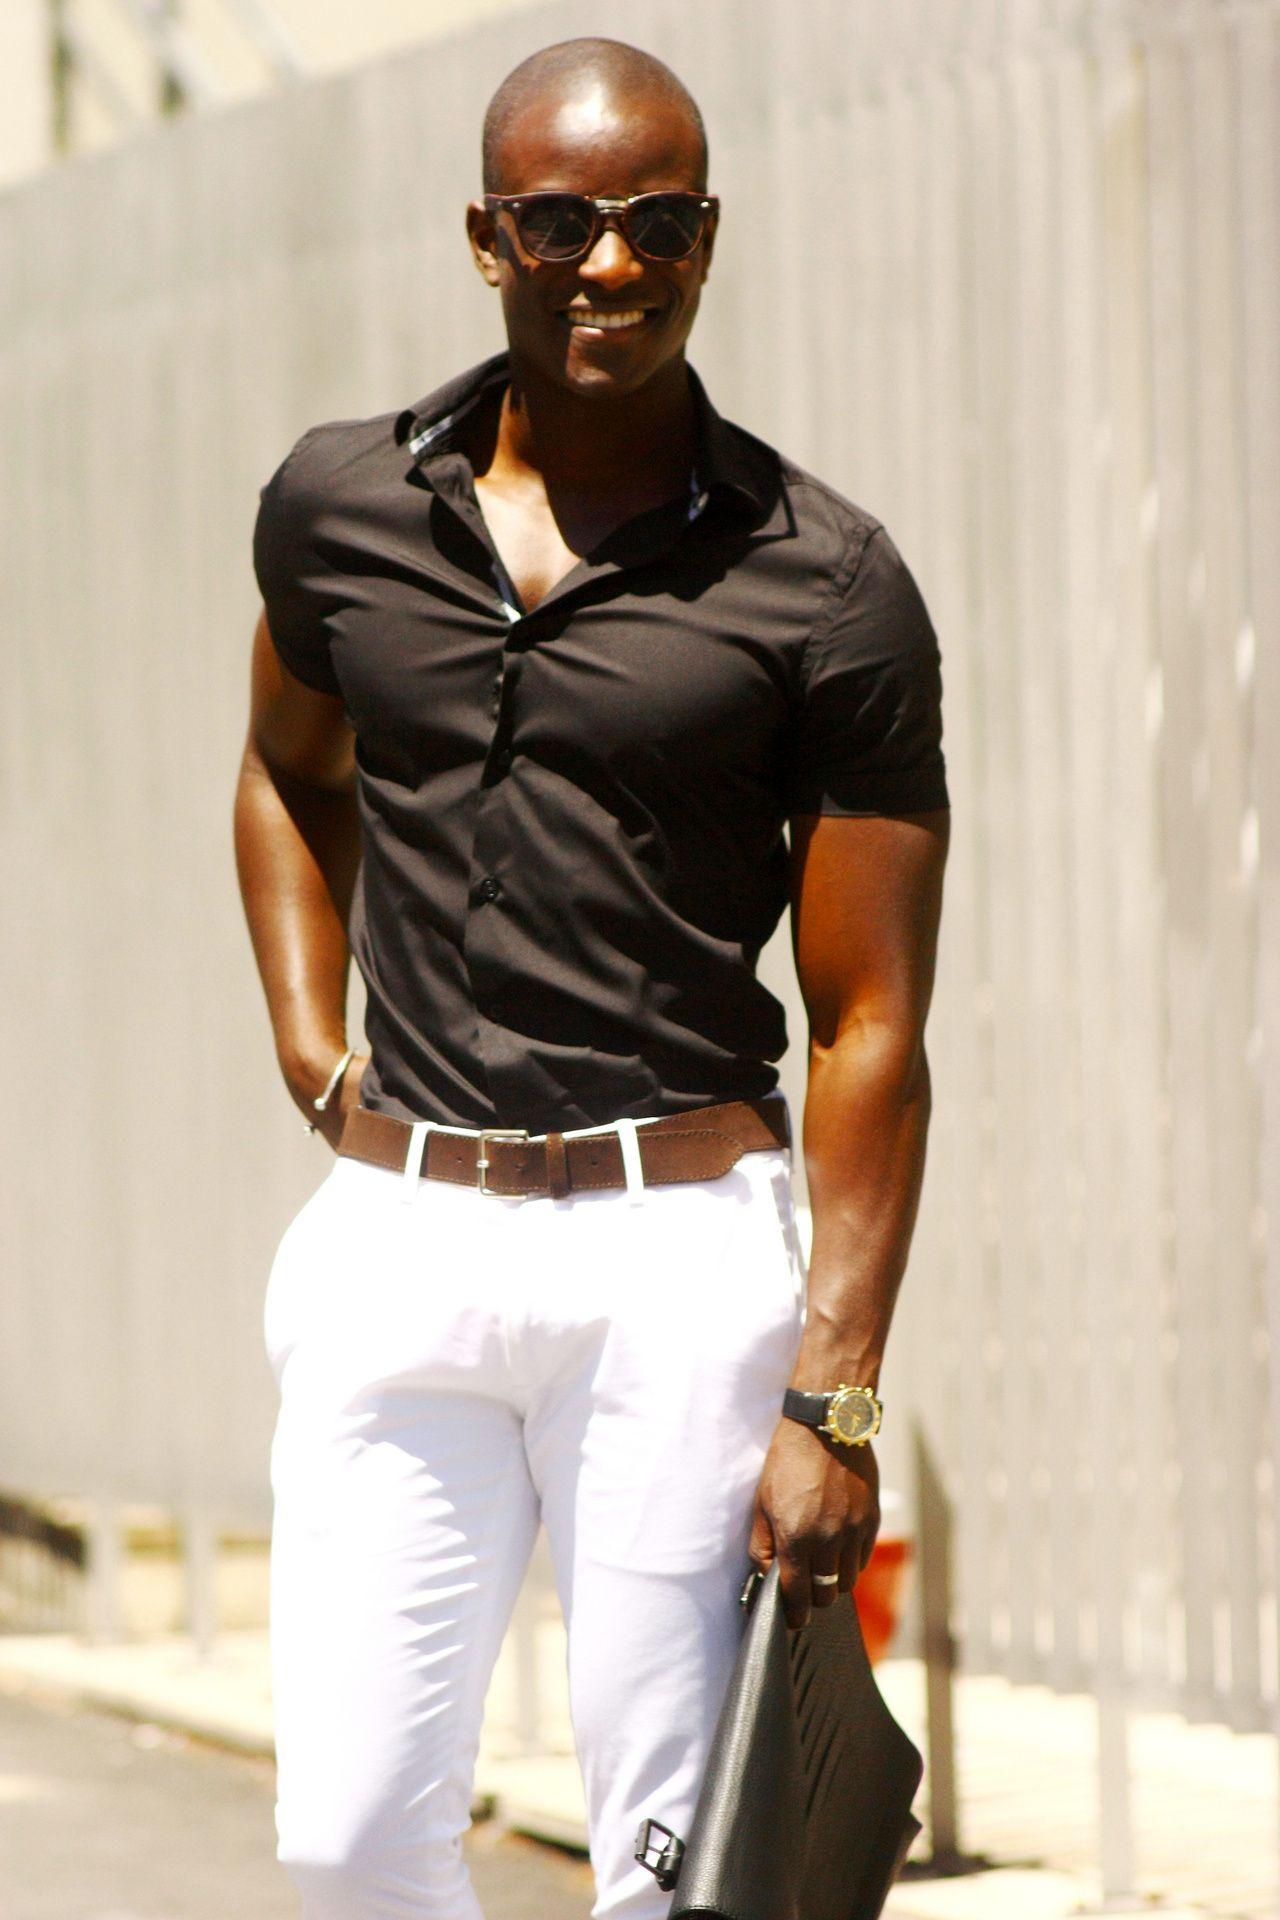 Swagwithamessage Cartier Pants Ysl Shirt Lorenz Watch Narid Isaac 24 Porto